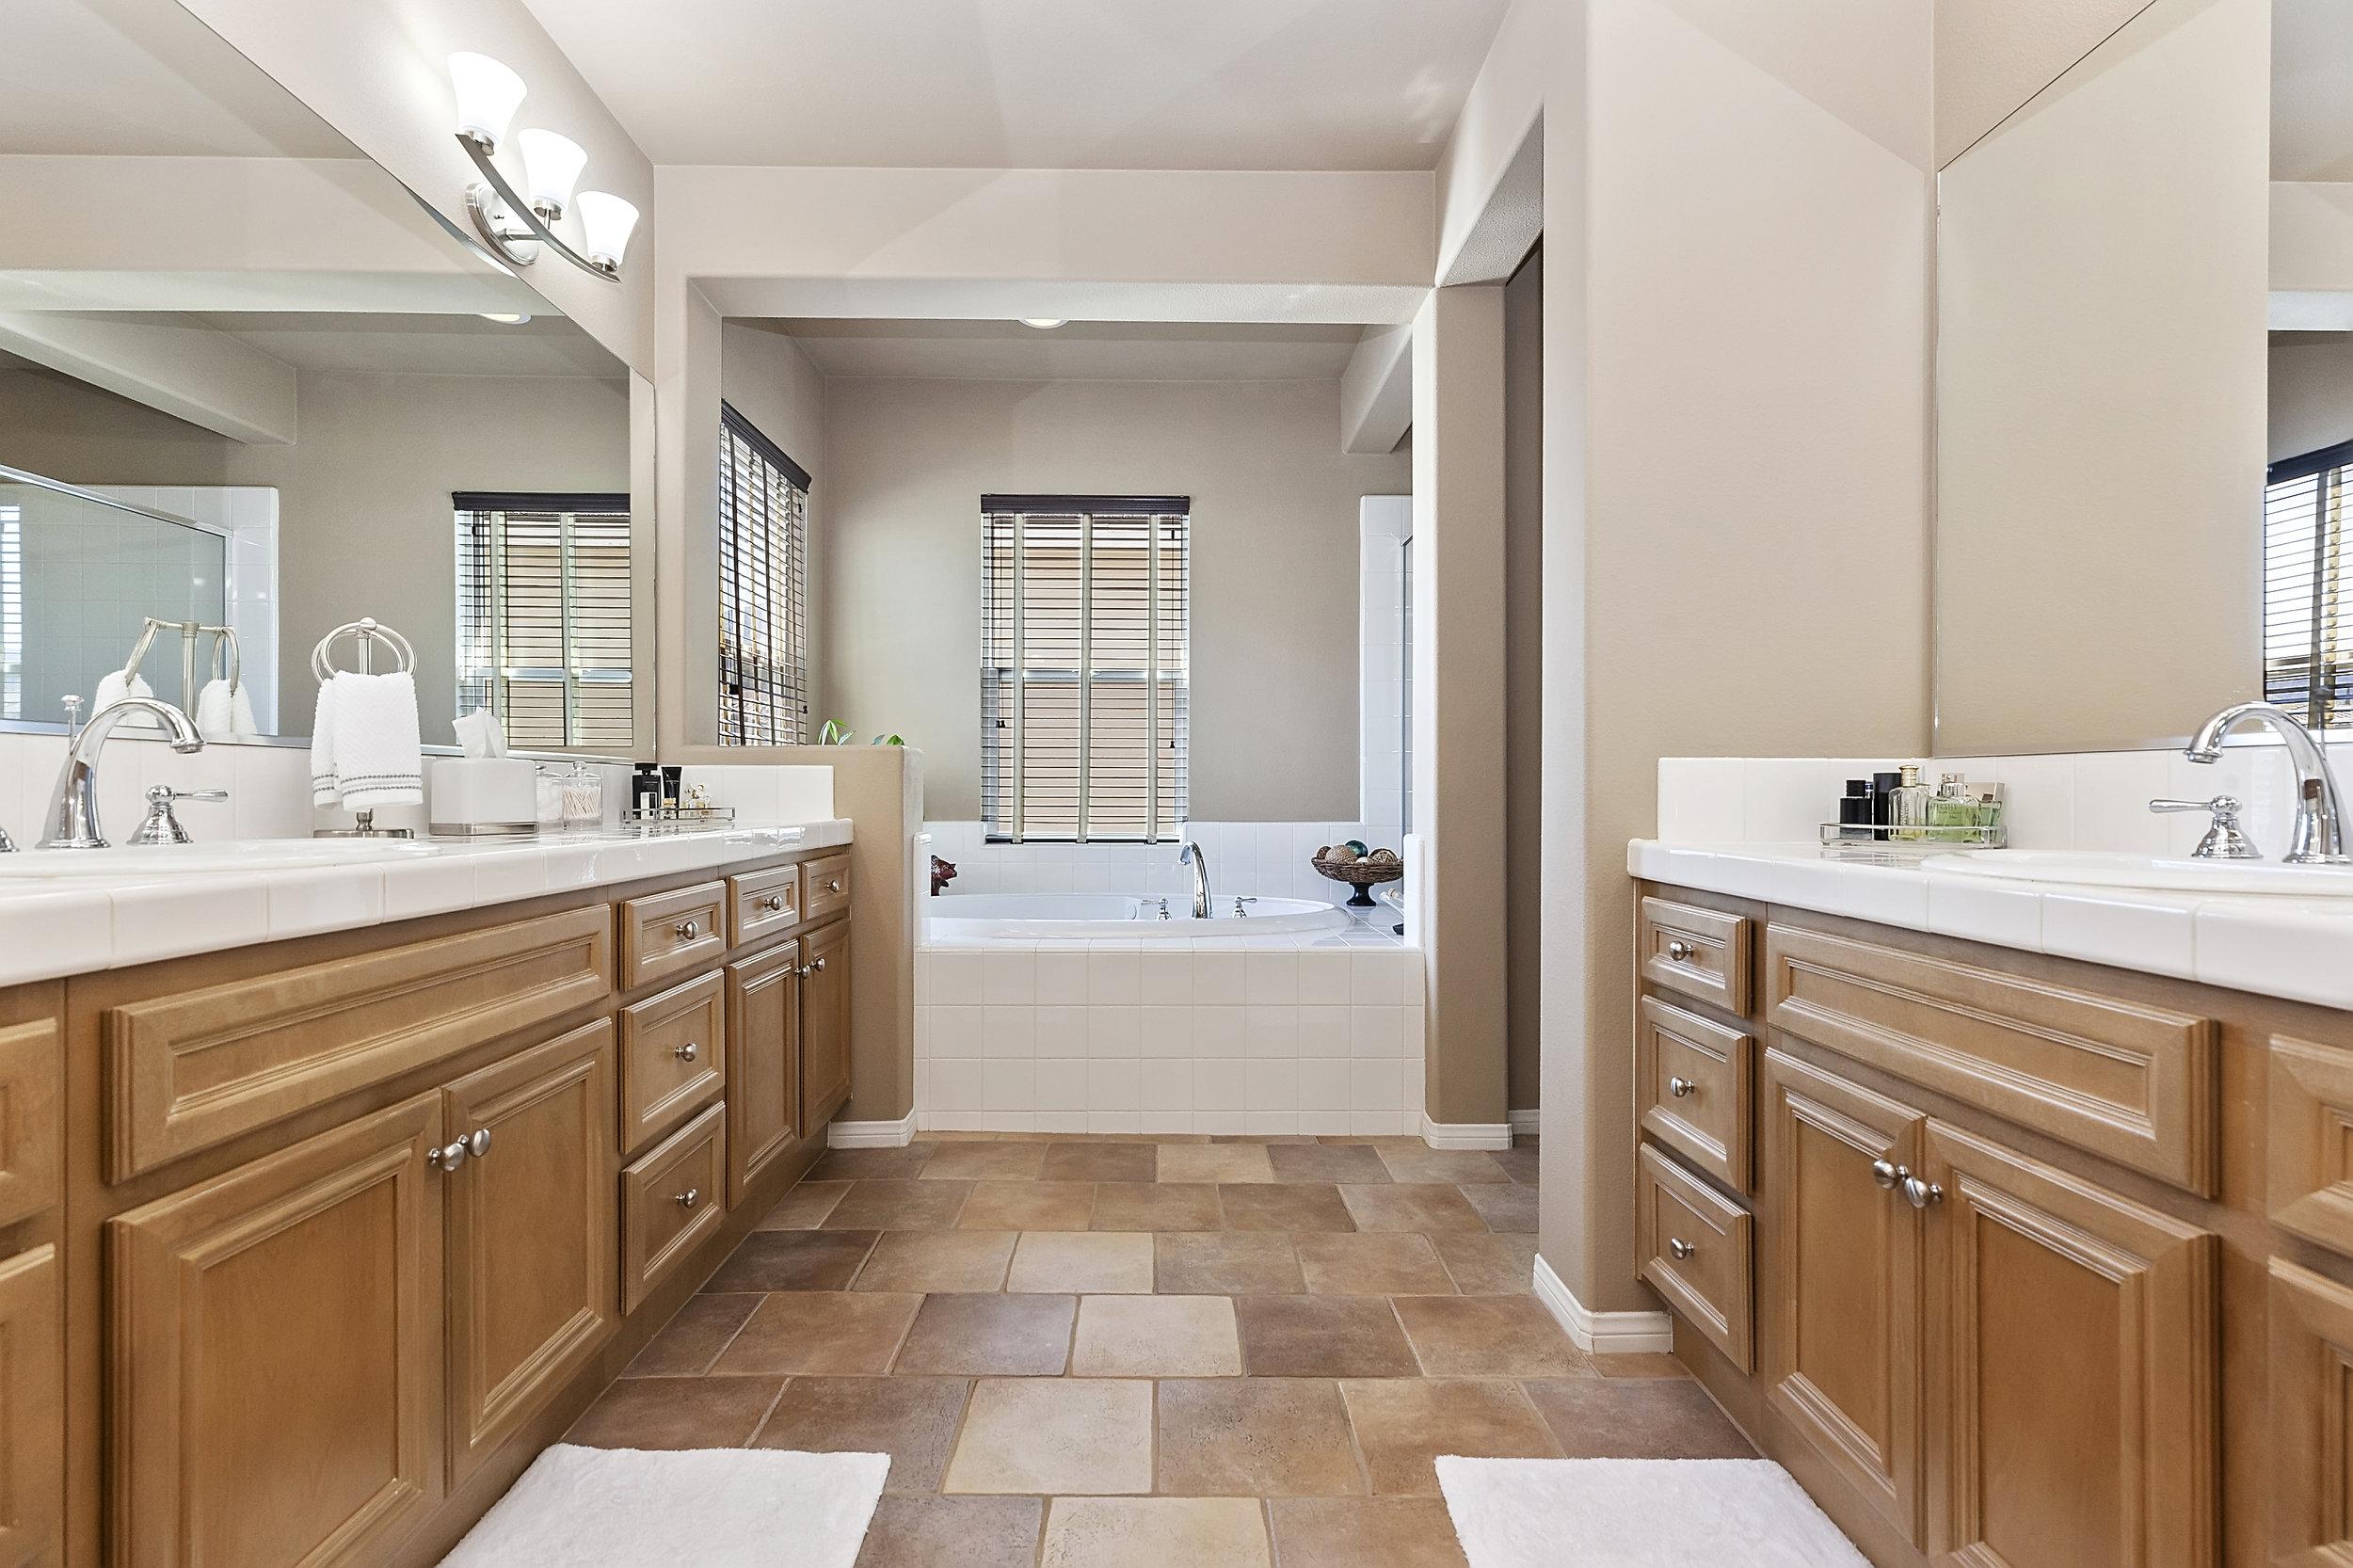 031_Master Bathroom.jpg